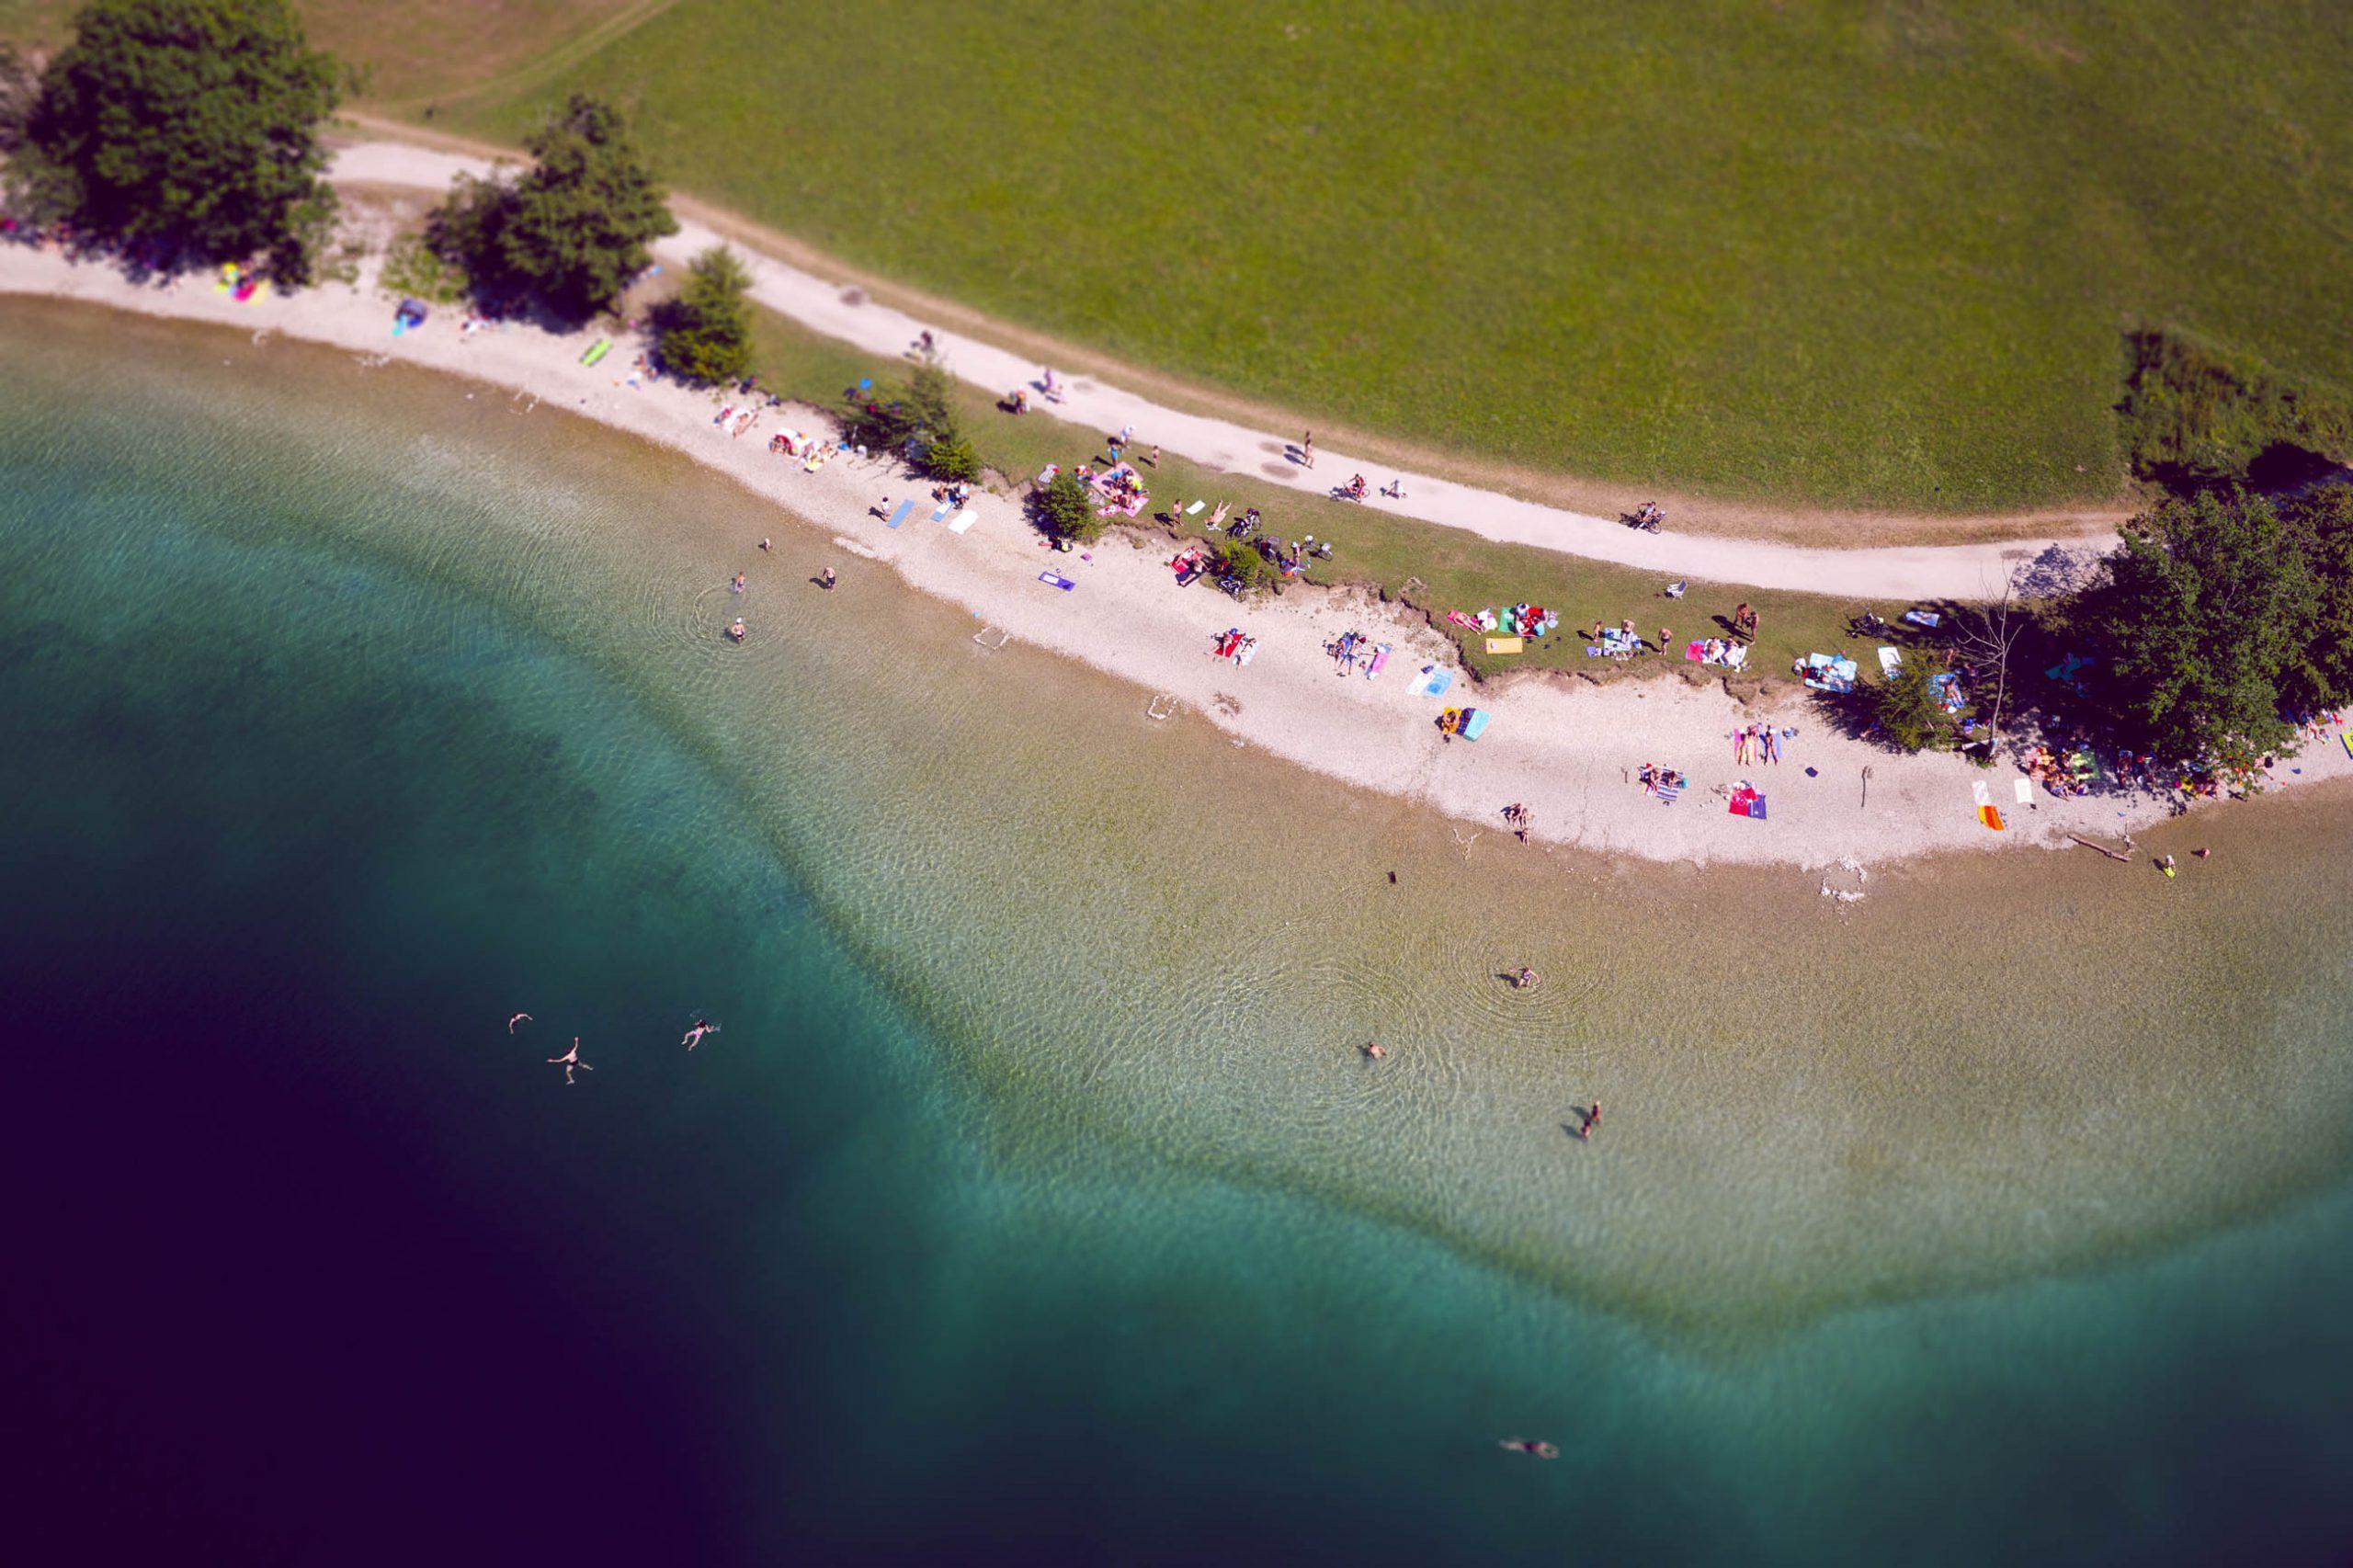 <p>Lake Bohinj, Slovenia</p>